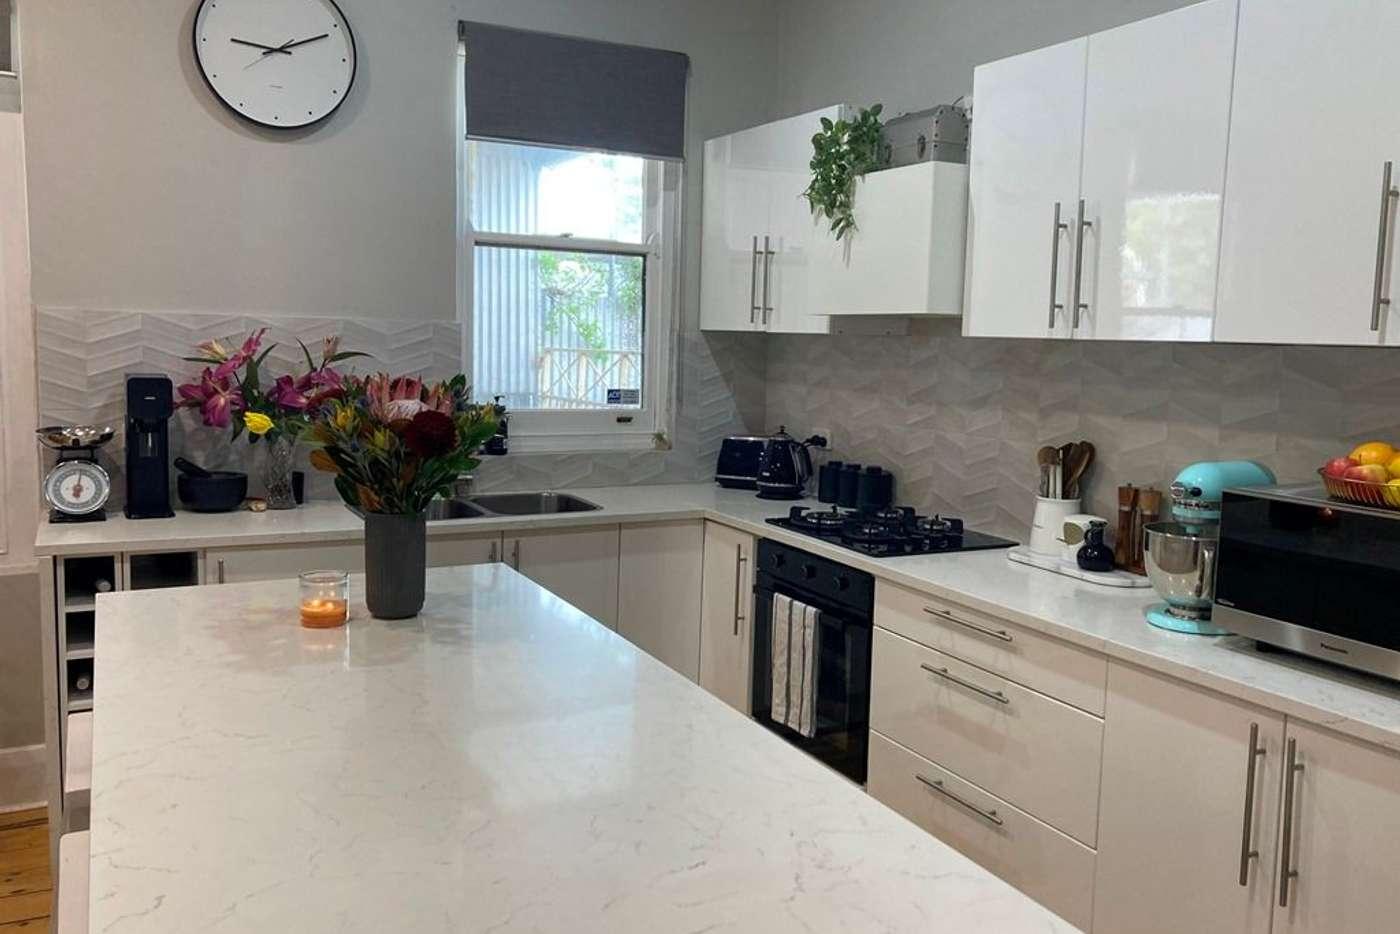 Seventh view of Homely house listing, 14 Seventh Avenue, Cheltenham SA 5014